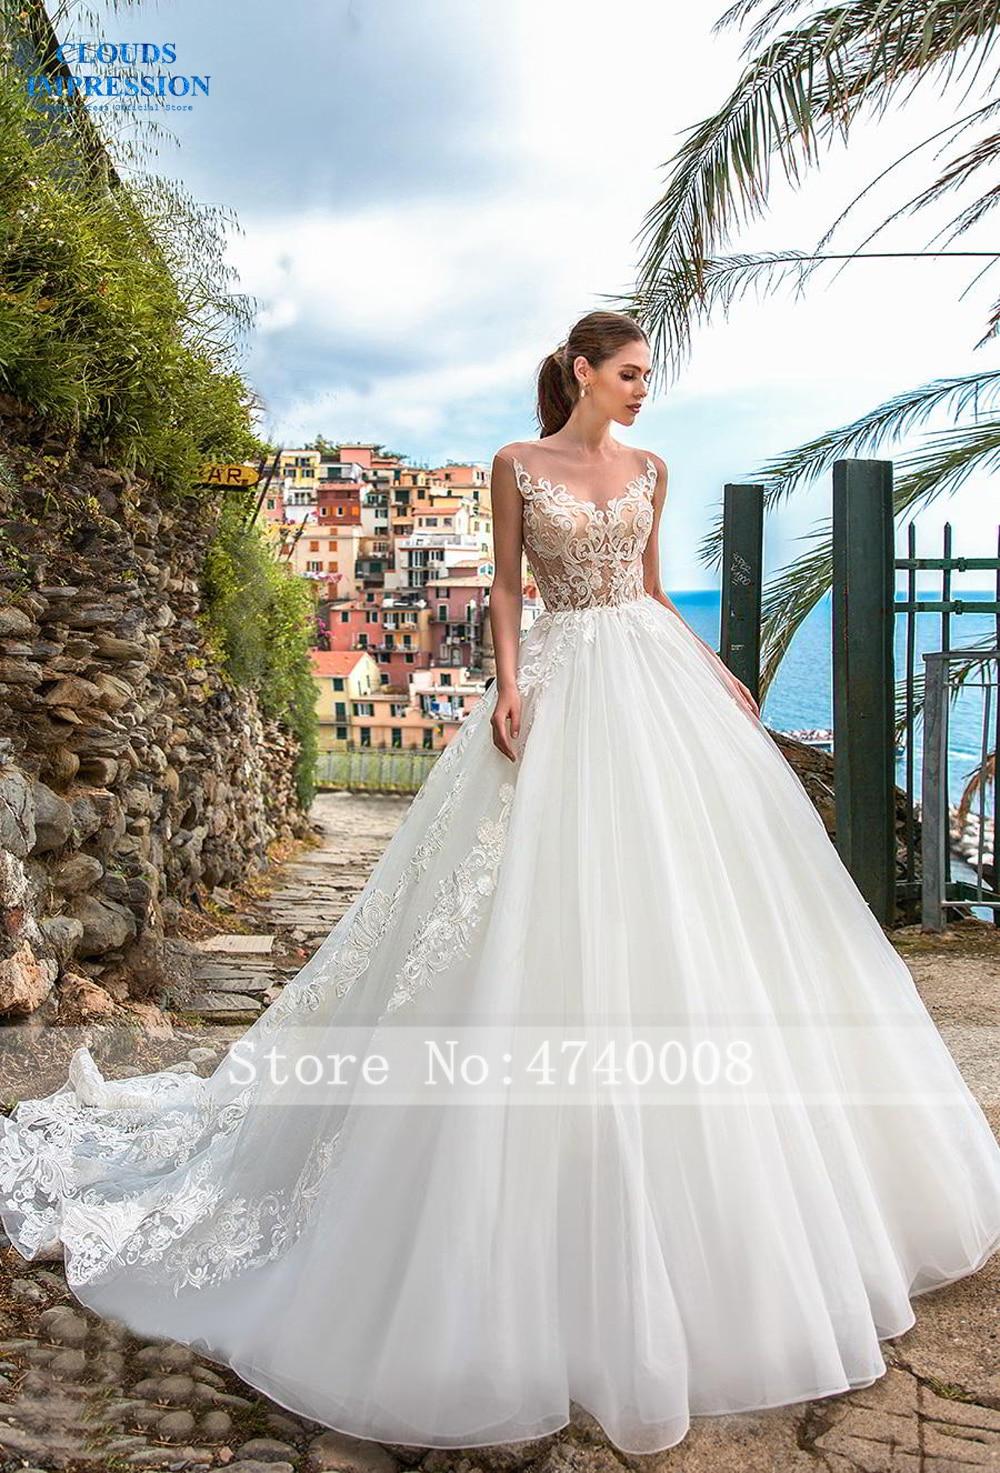 CLOUDS IMPRESSION Sexy A Line Wedding Dresses 2019 Appliques Vestido De Novia Gorgeous Beading White Bridal Gown Bride Dress